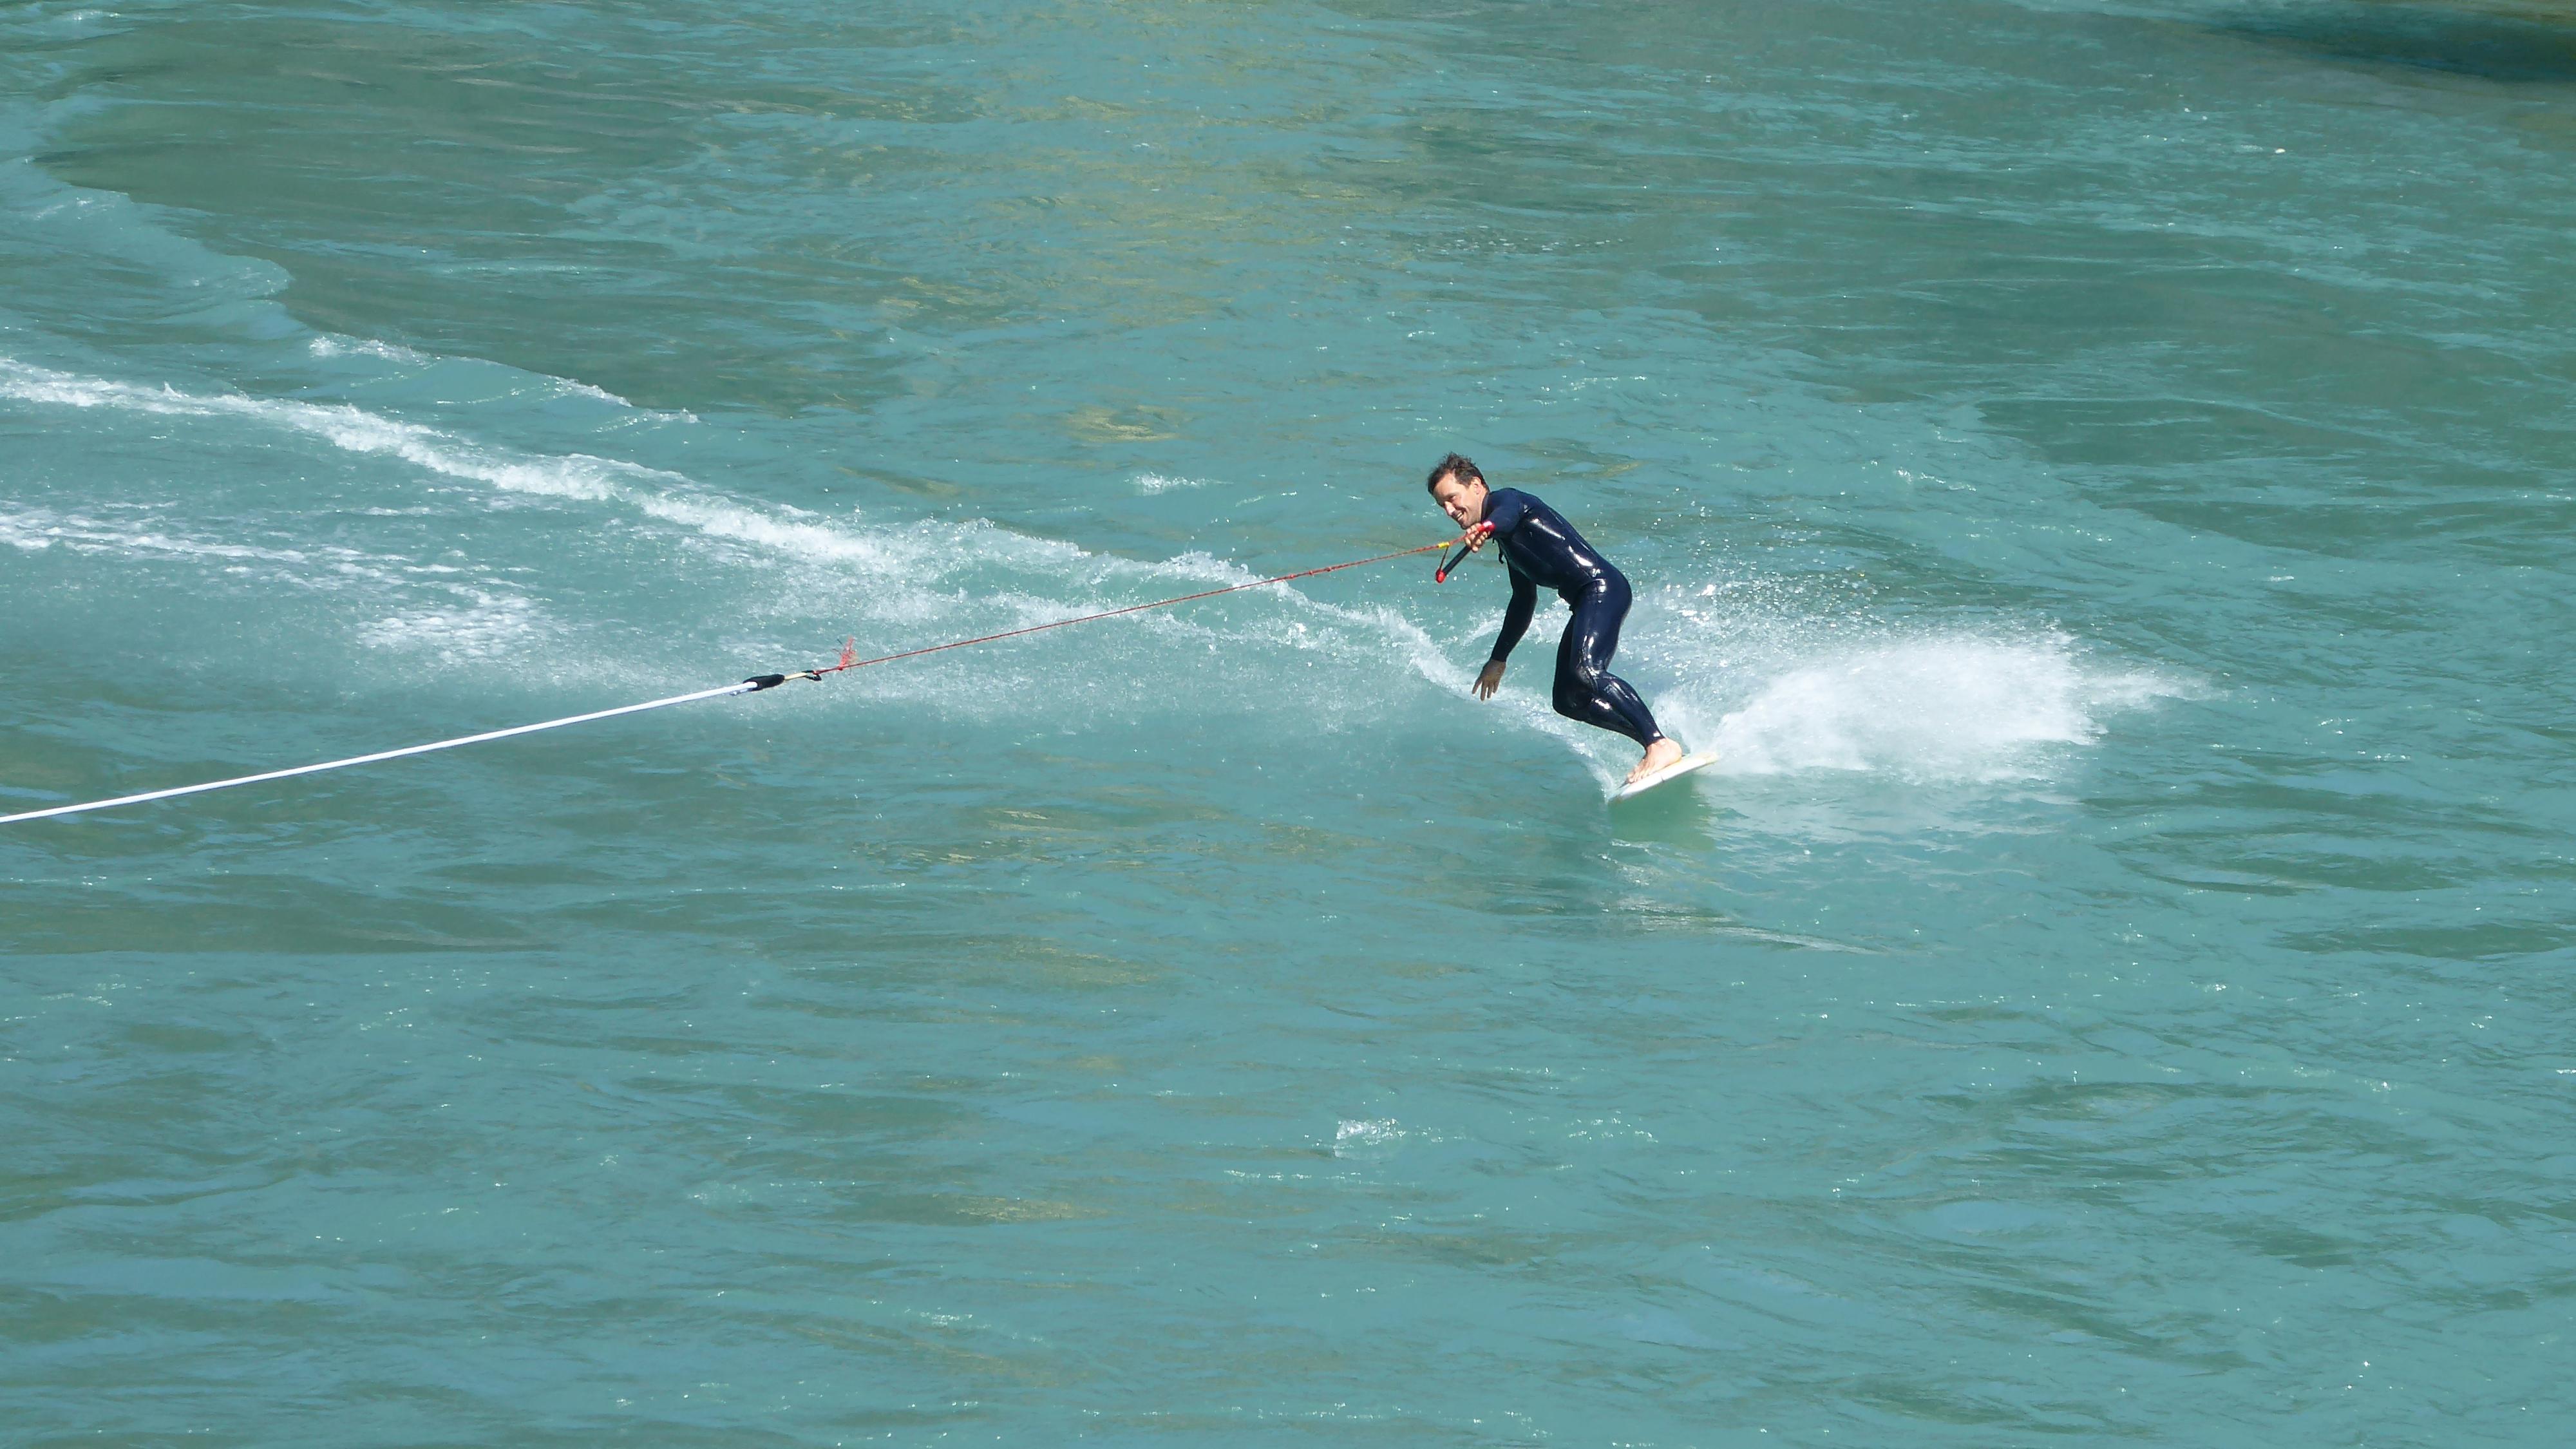 200707_wakeboard_5